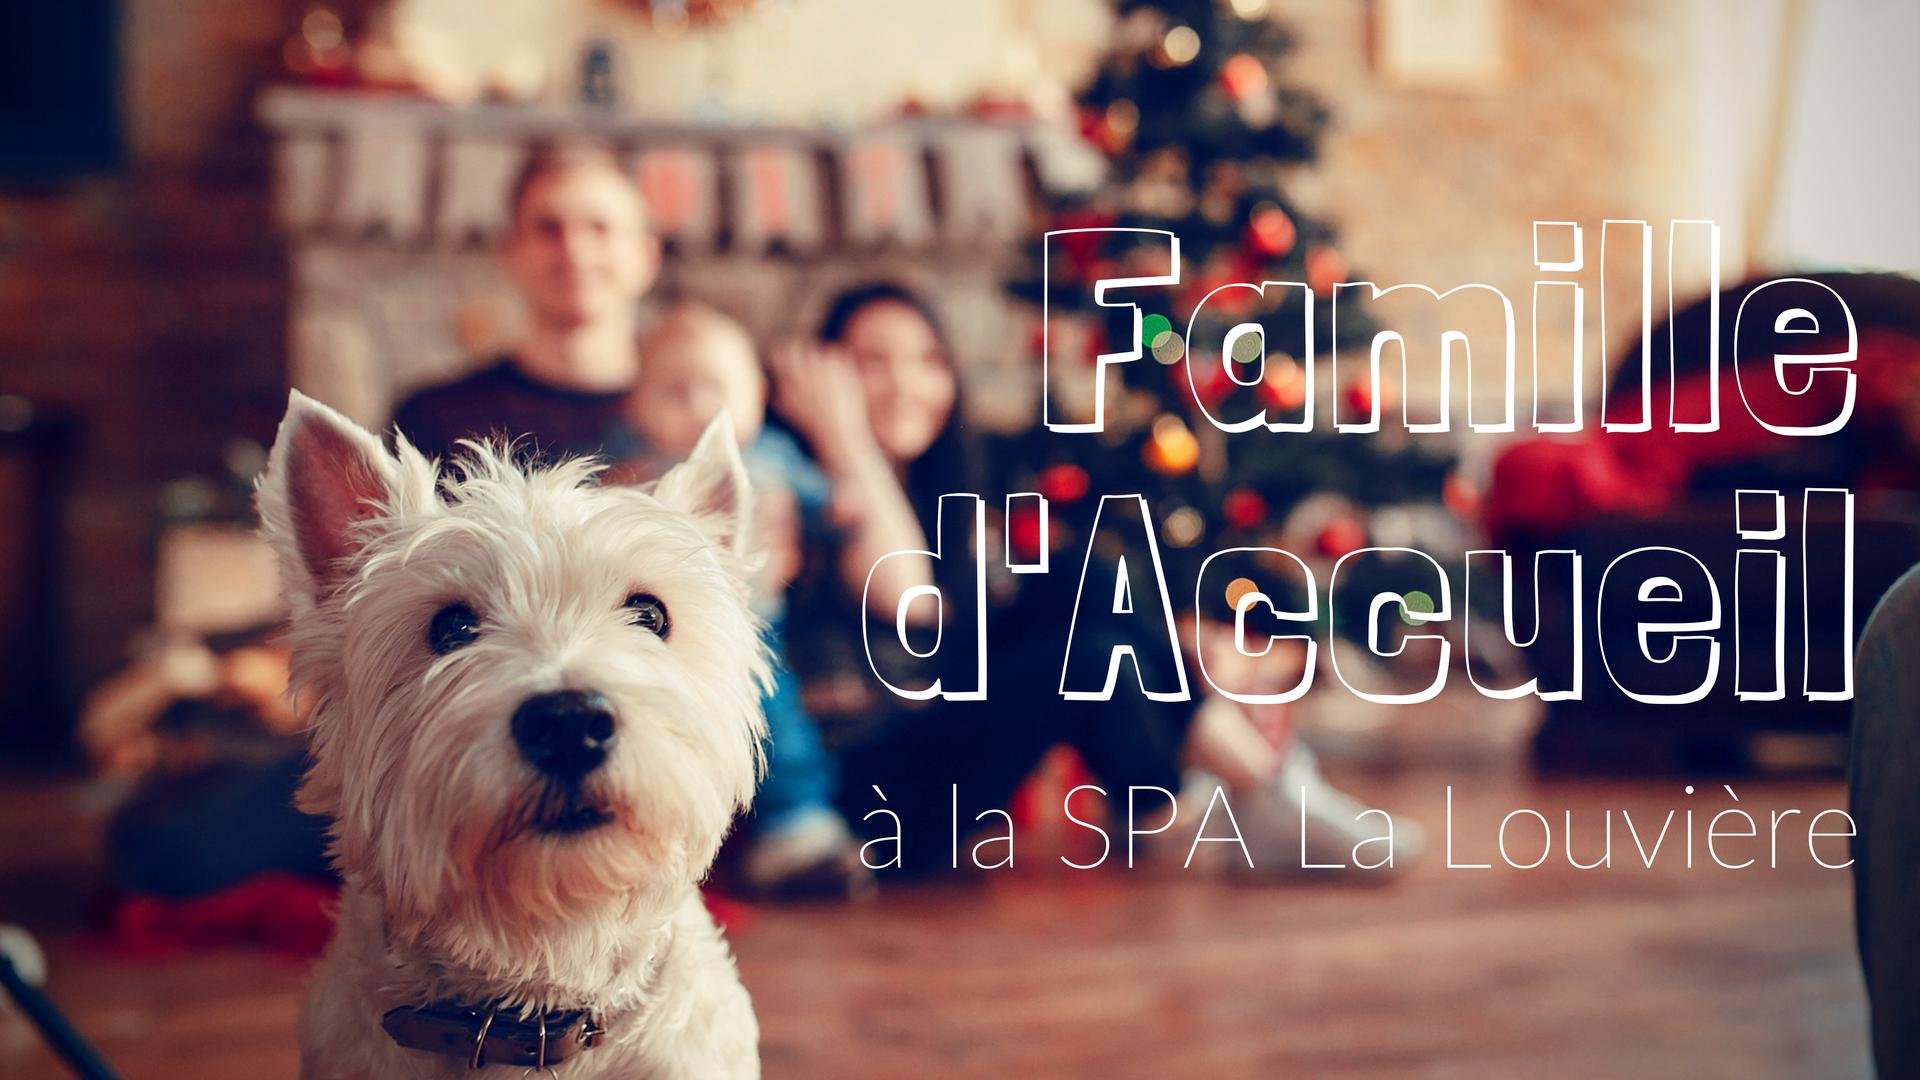 Famille d'Accueil SPA - Copyright Freepik.com